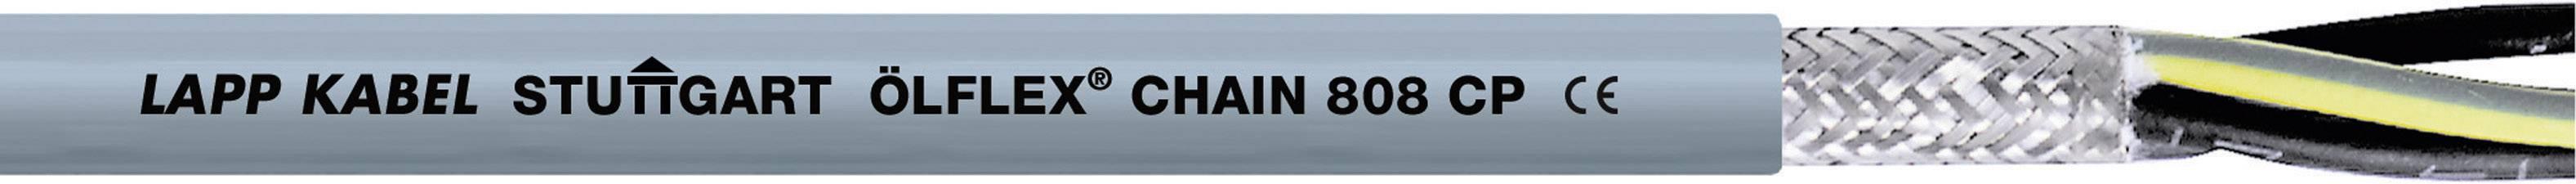 Žíla kabelu LappKabel ÖLFLEX CHAIN 808 CP 12G1,0 (1027772), 12x 1 mm², polyurethan, Ø 11,7 mm, stíněný, 100 m,